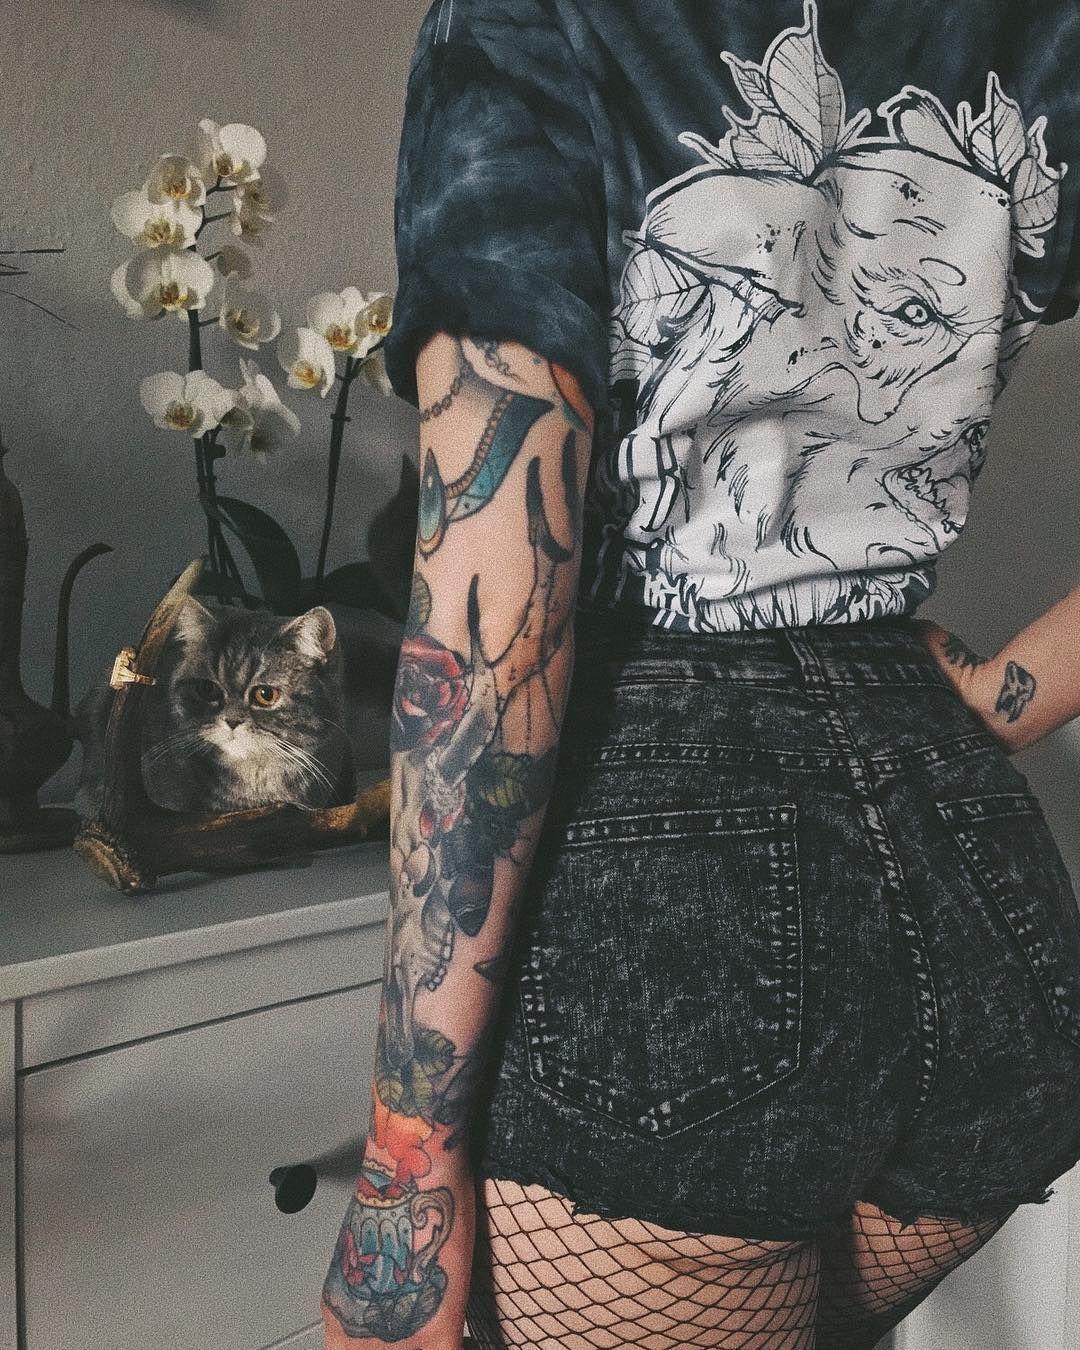 You Never Walk Alone Girl Tattoos Grunge Outfits Grunge Fashion